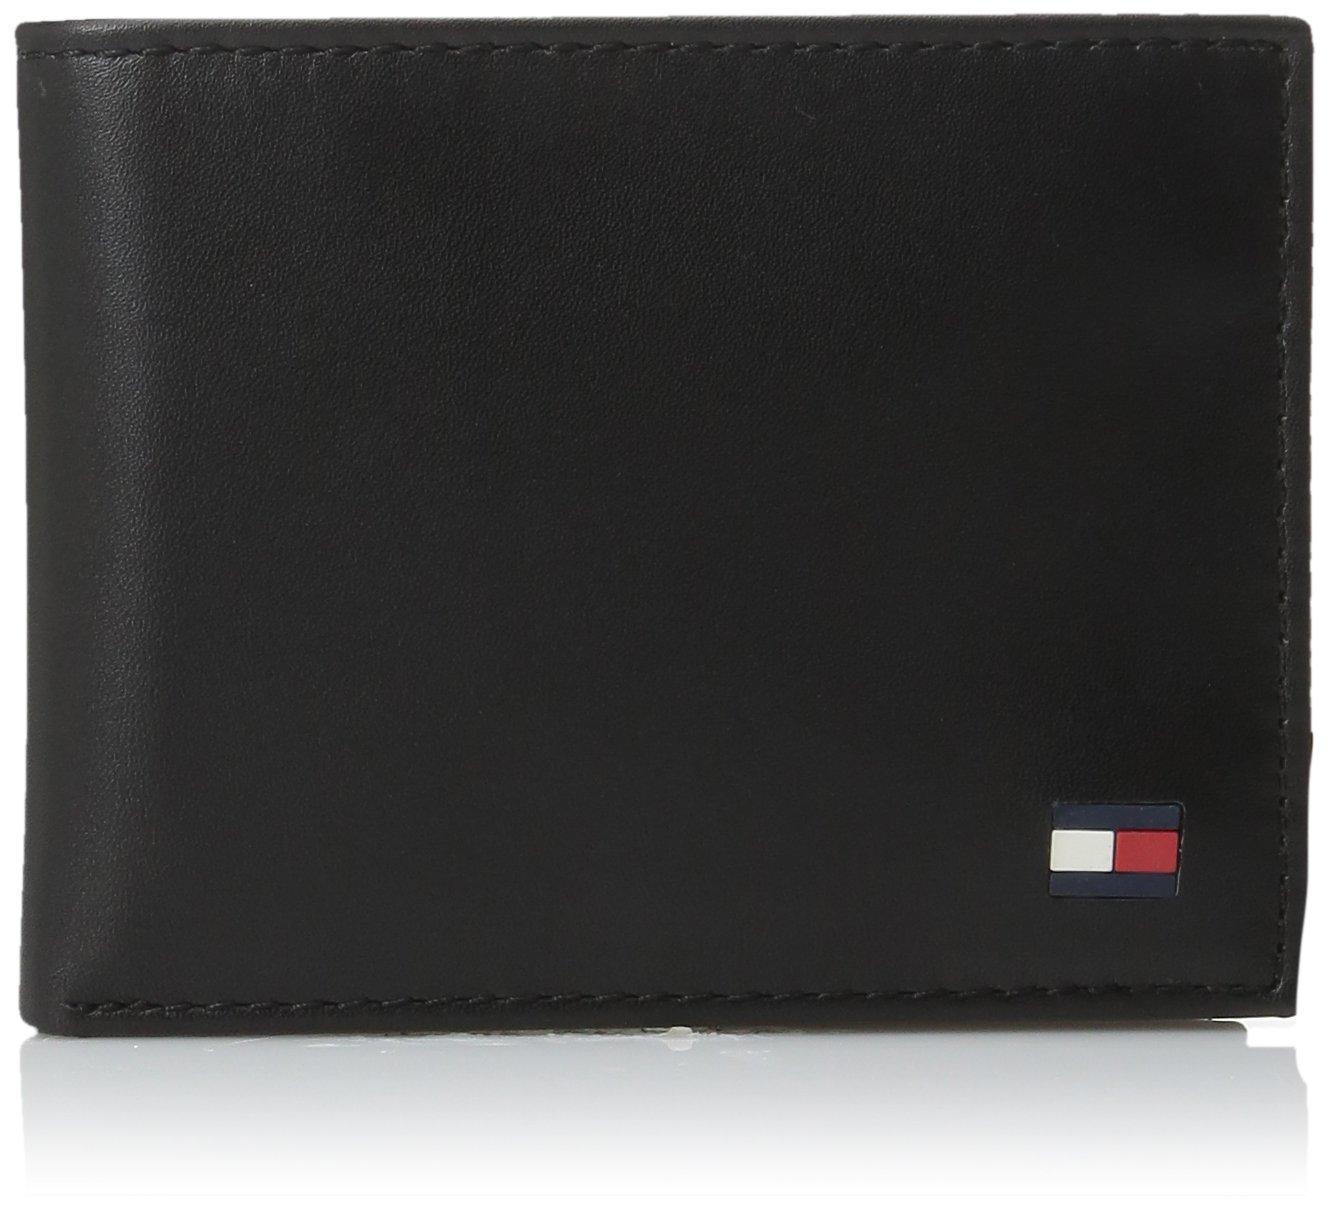 Tommy Hilfiger Men's Dore Passcase Billfold Wallet,Black,One Size